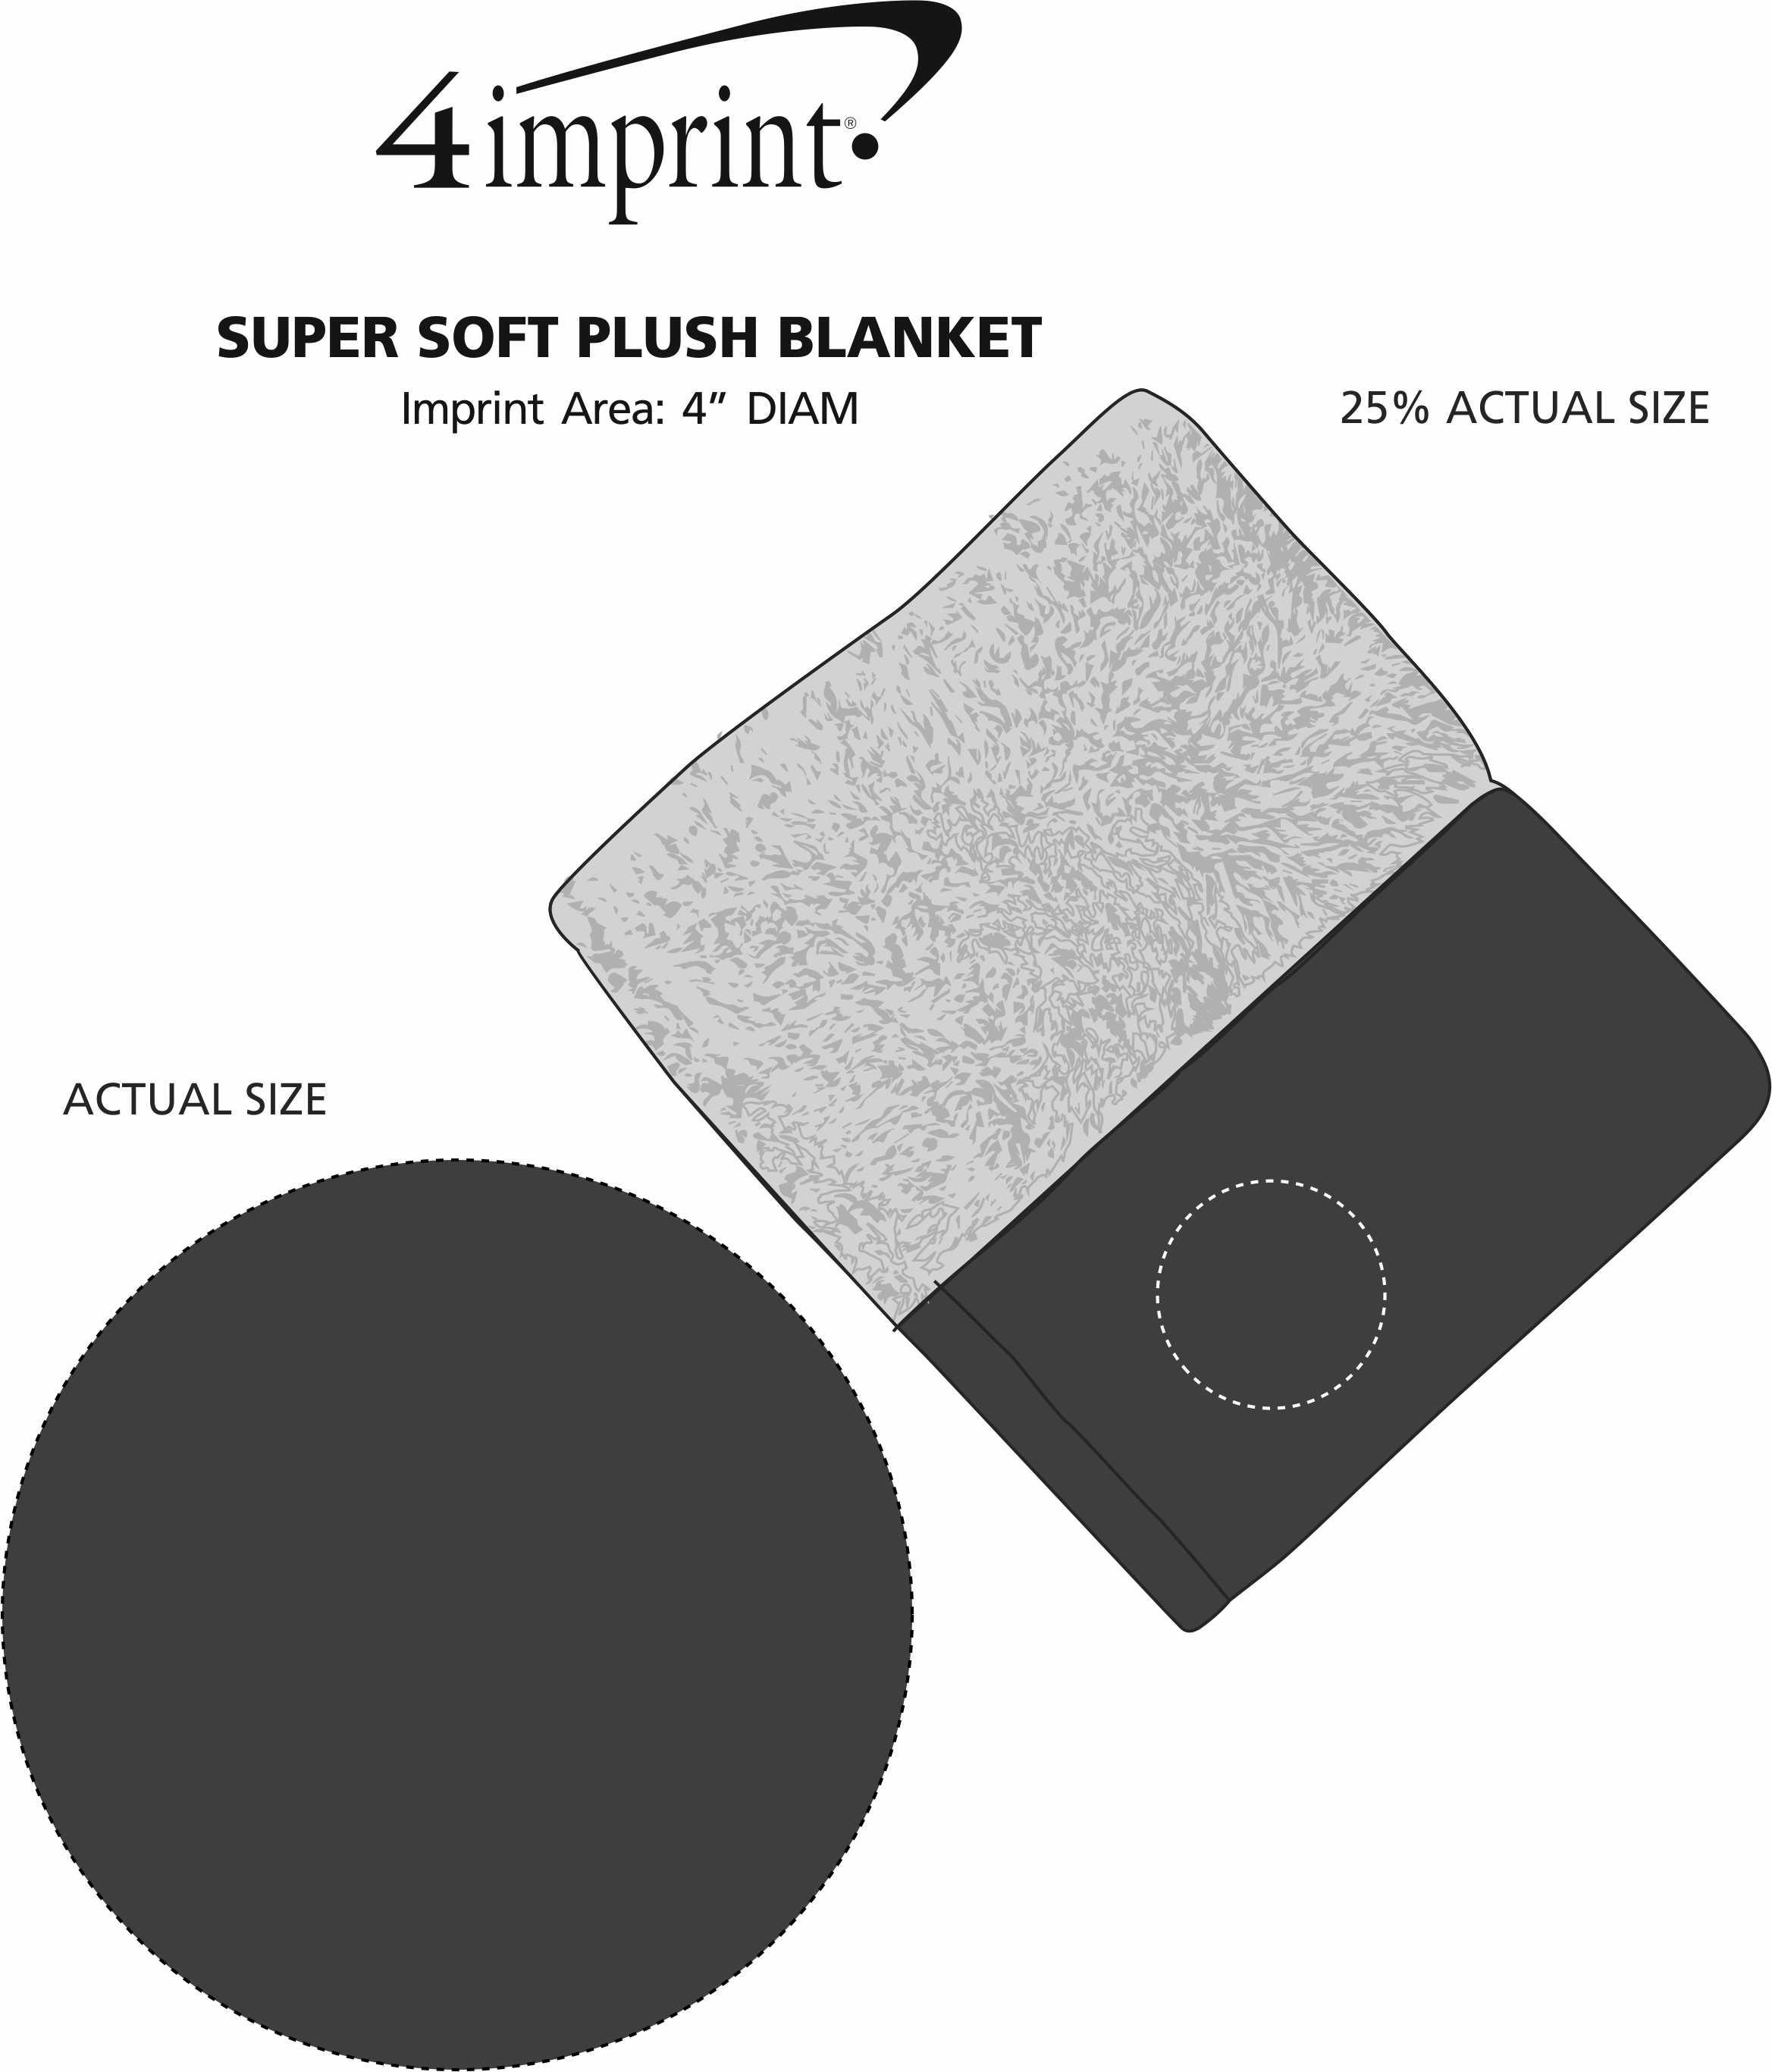 Imprint Area of Super Soft Plush Blanket